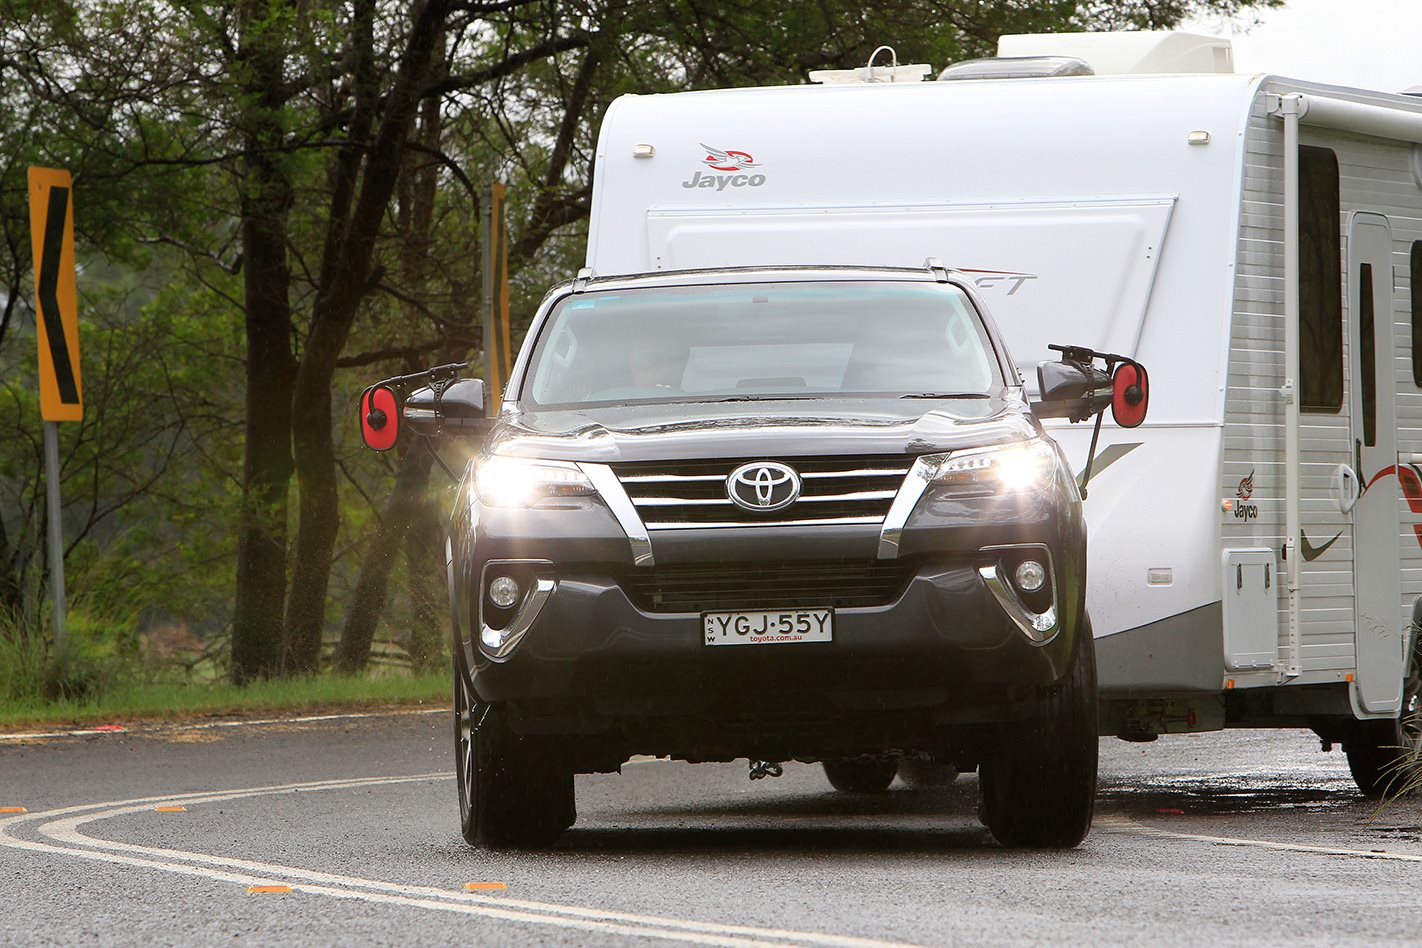 2017 Toyota Fortuner Crusade headlights